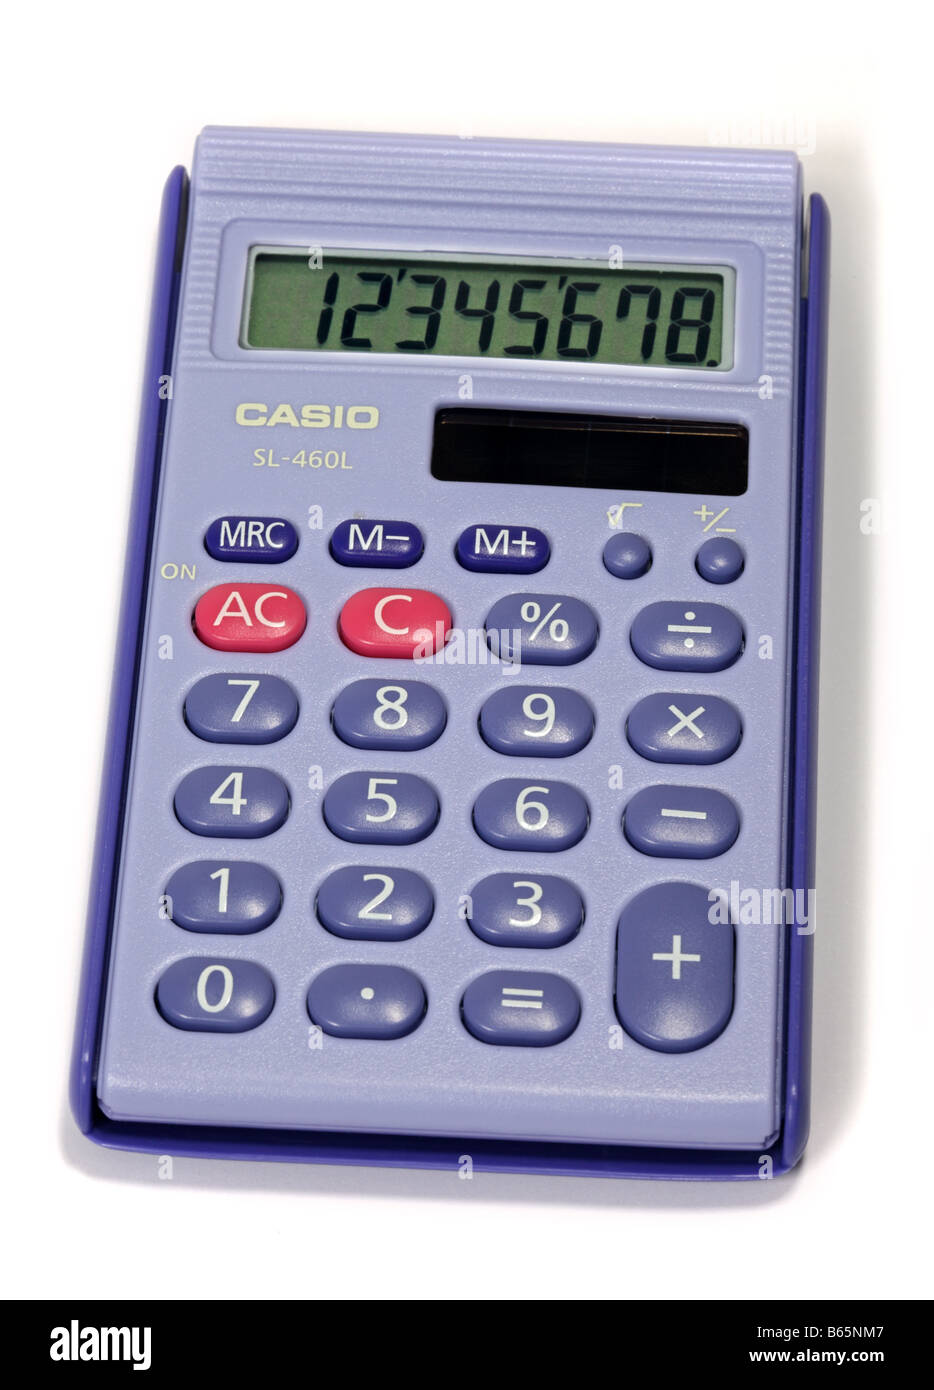 Casio Solar Powered Calculator - Stock Image